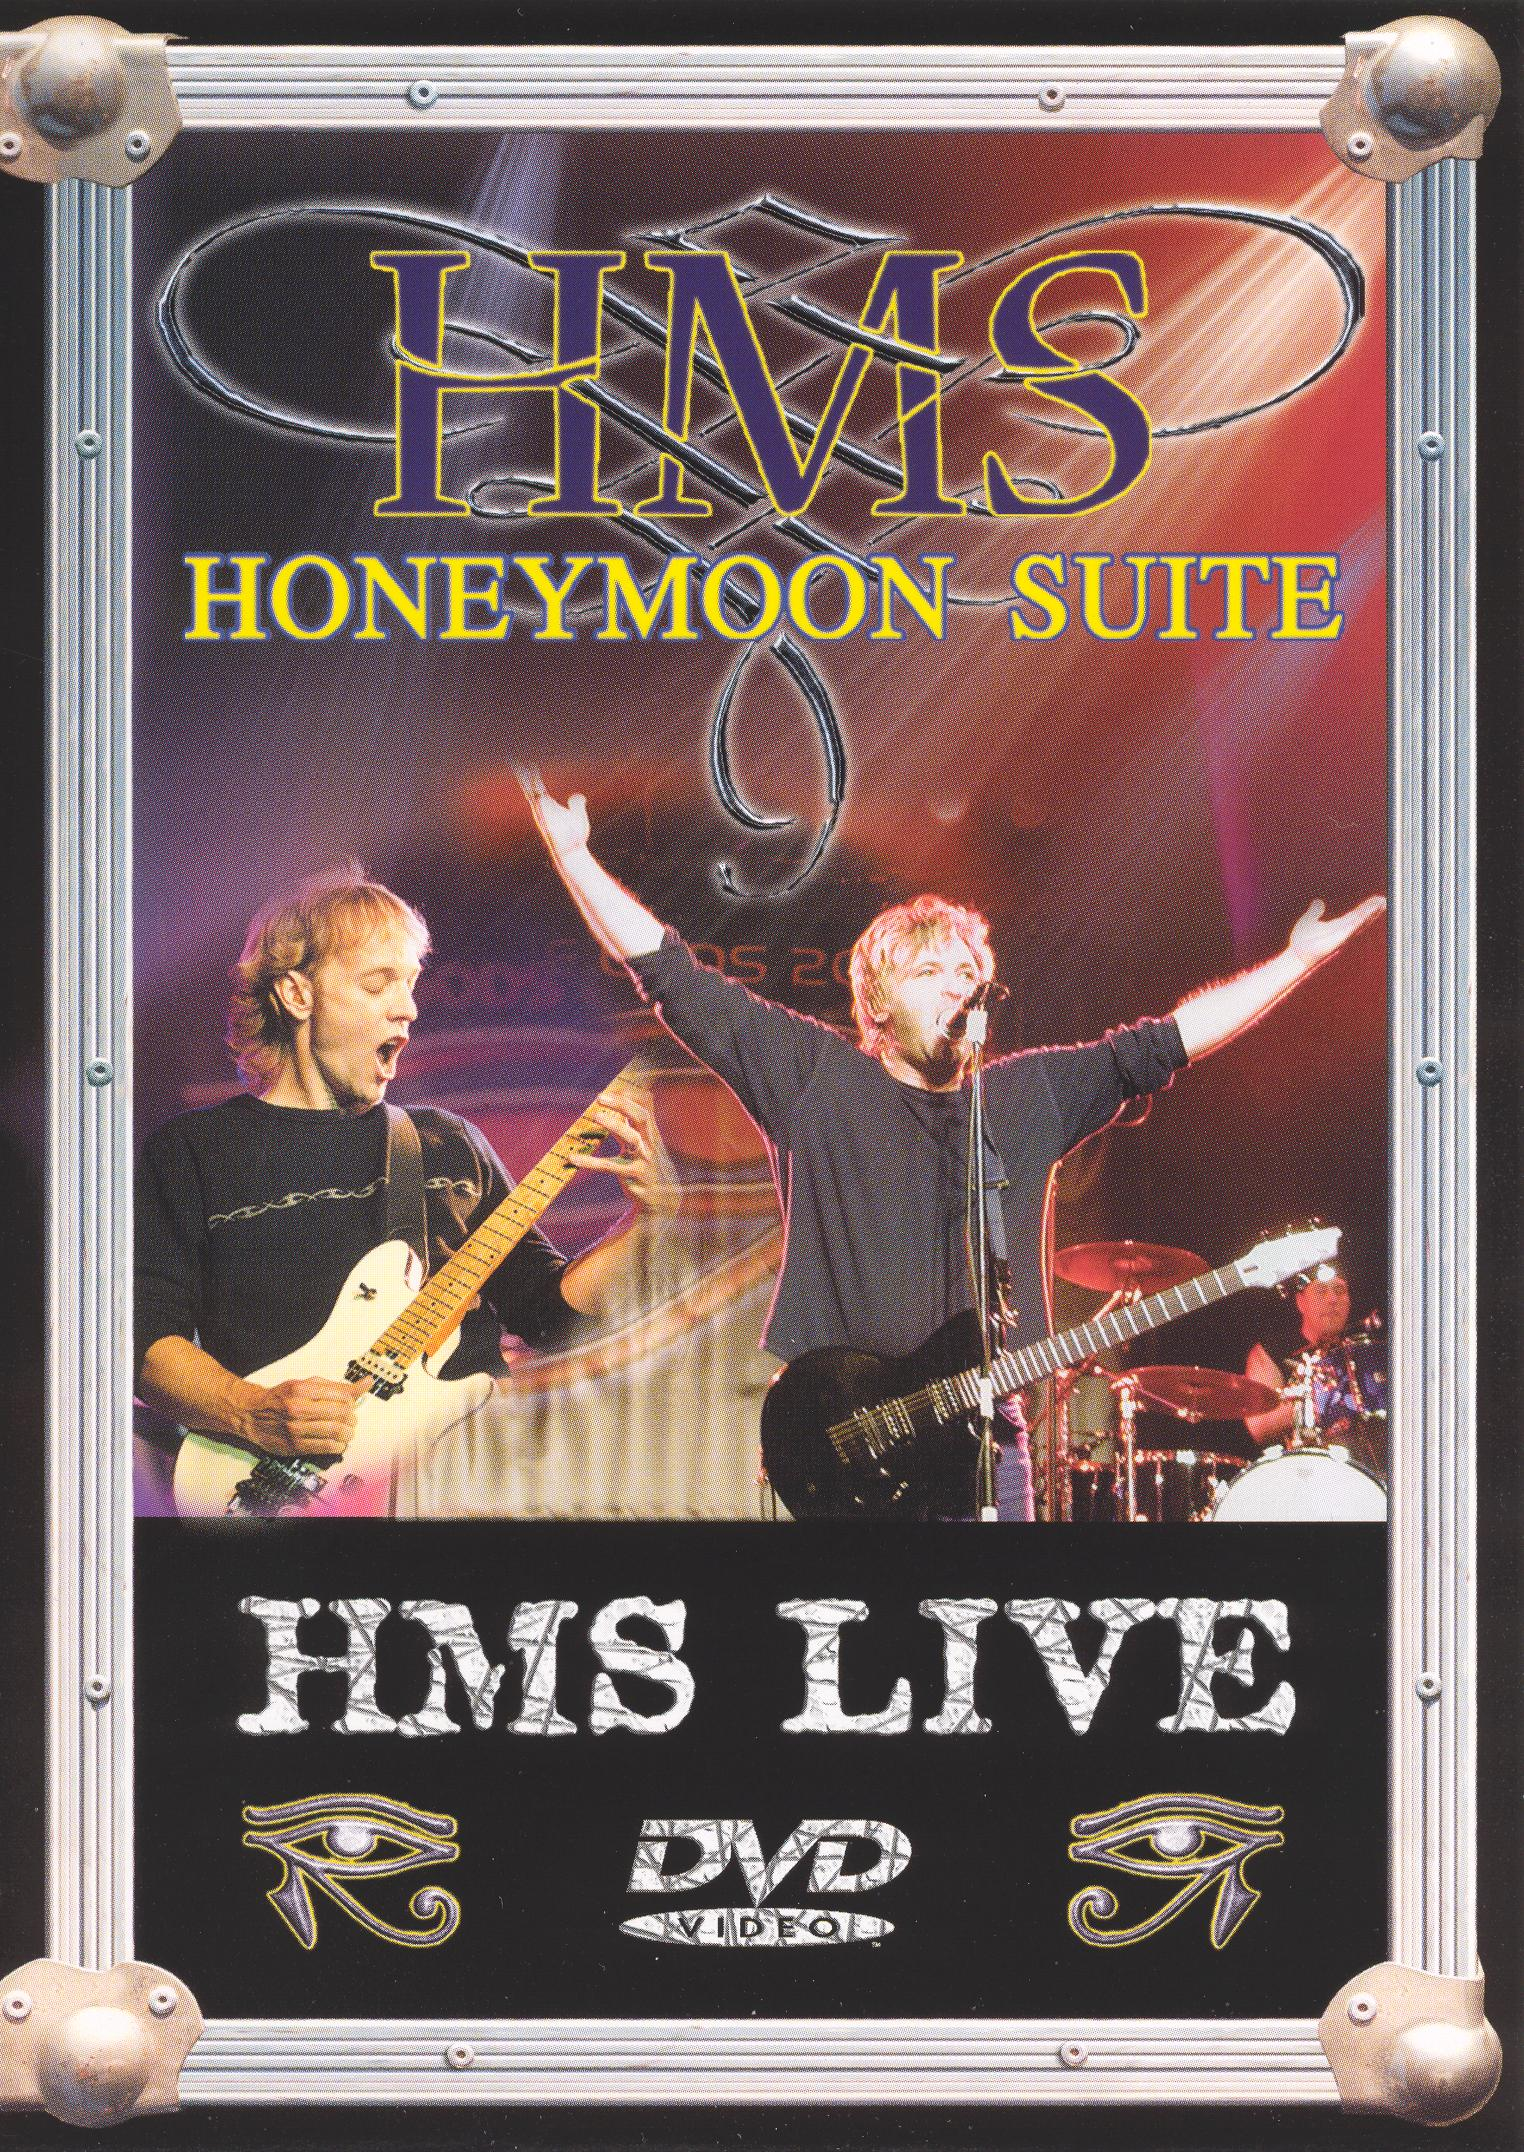 Honeymoon Suite: HMS Live